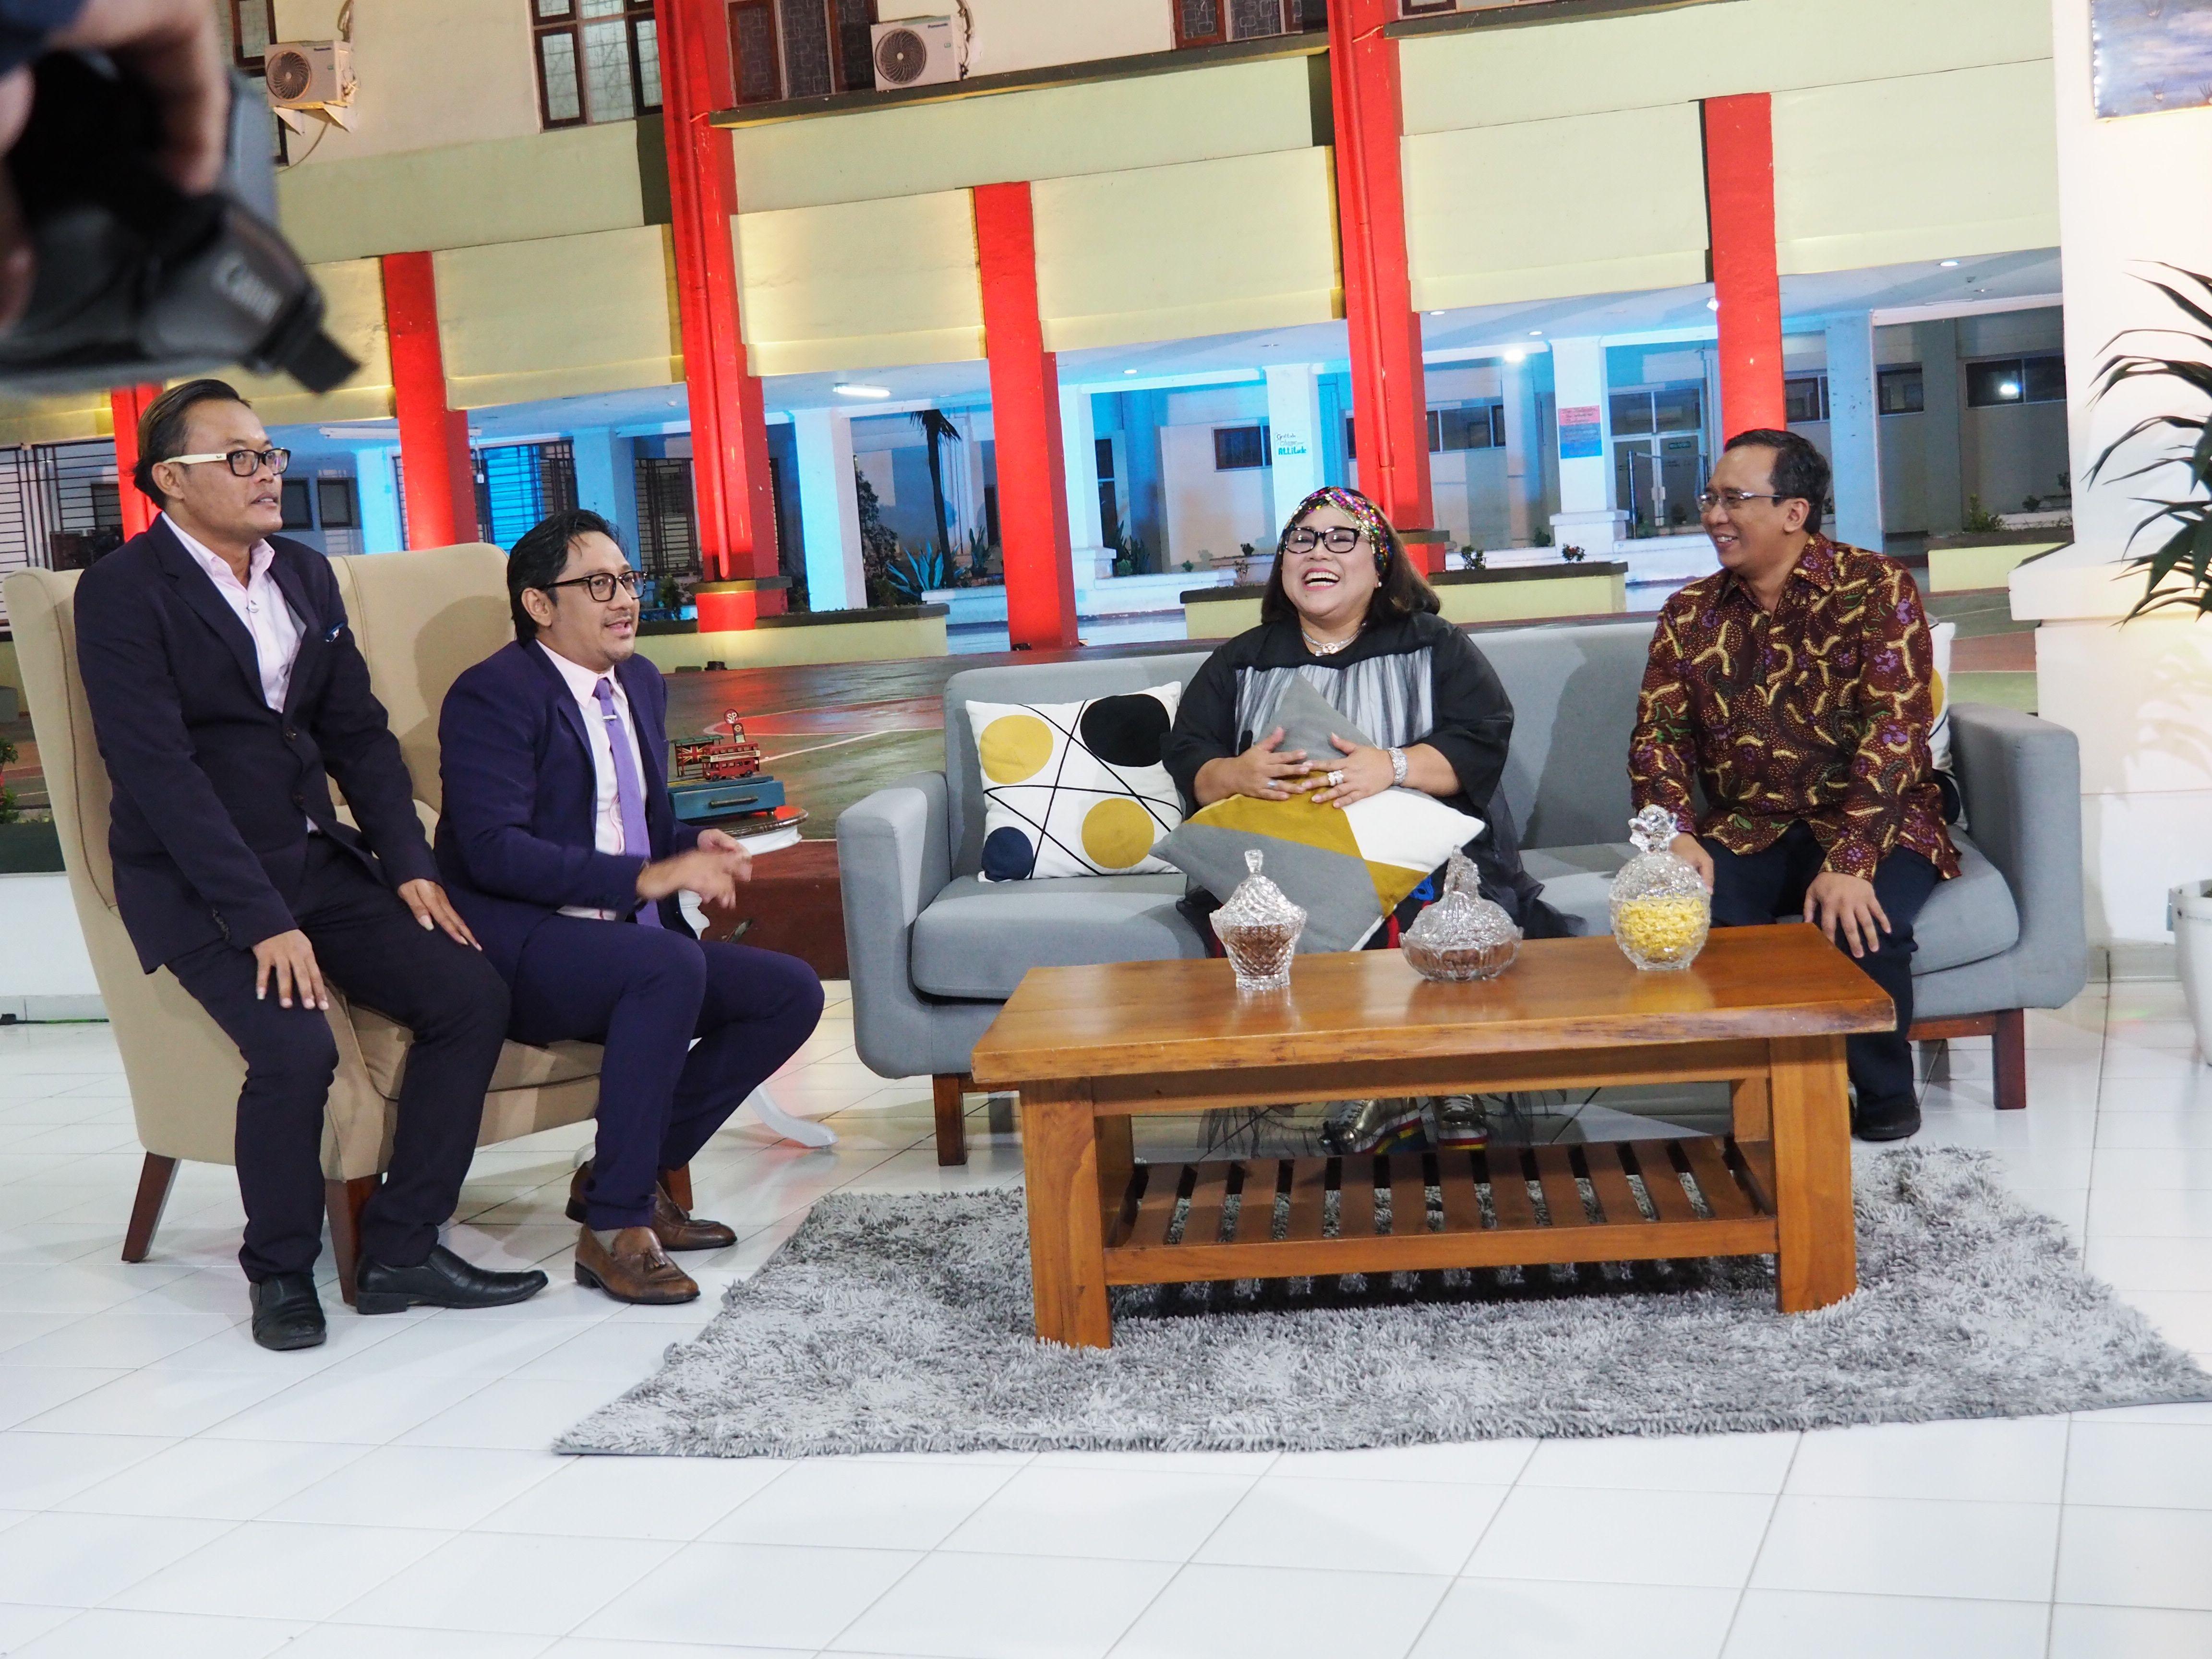 Deskripsi : Ini Talk Show hadir di RSKO Jakarta I Sumber Foto : dokpri